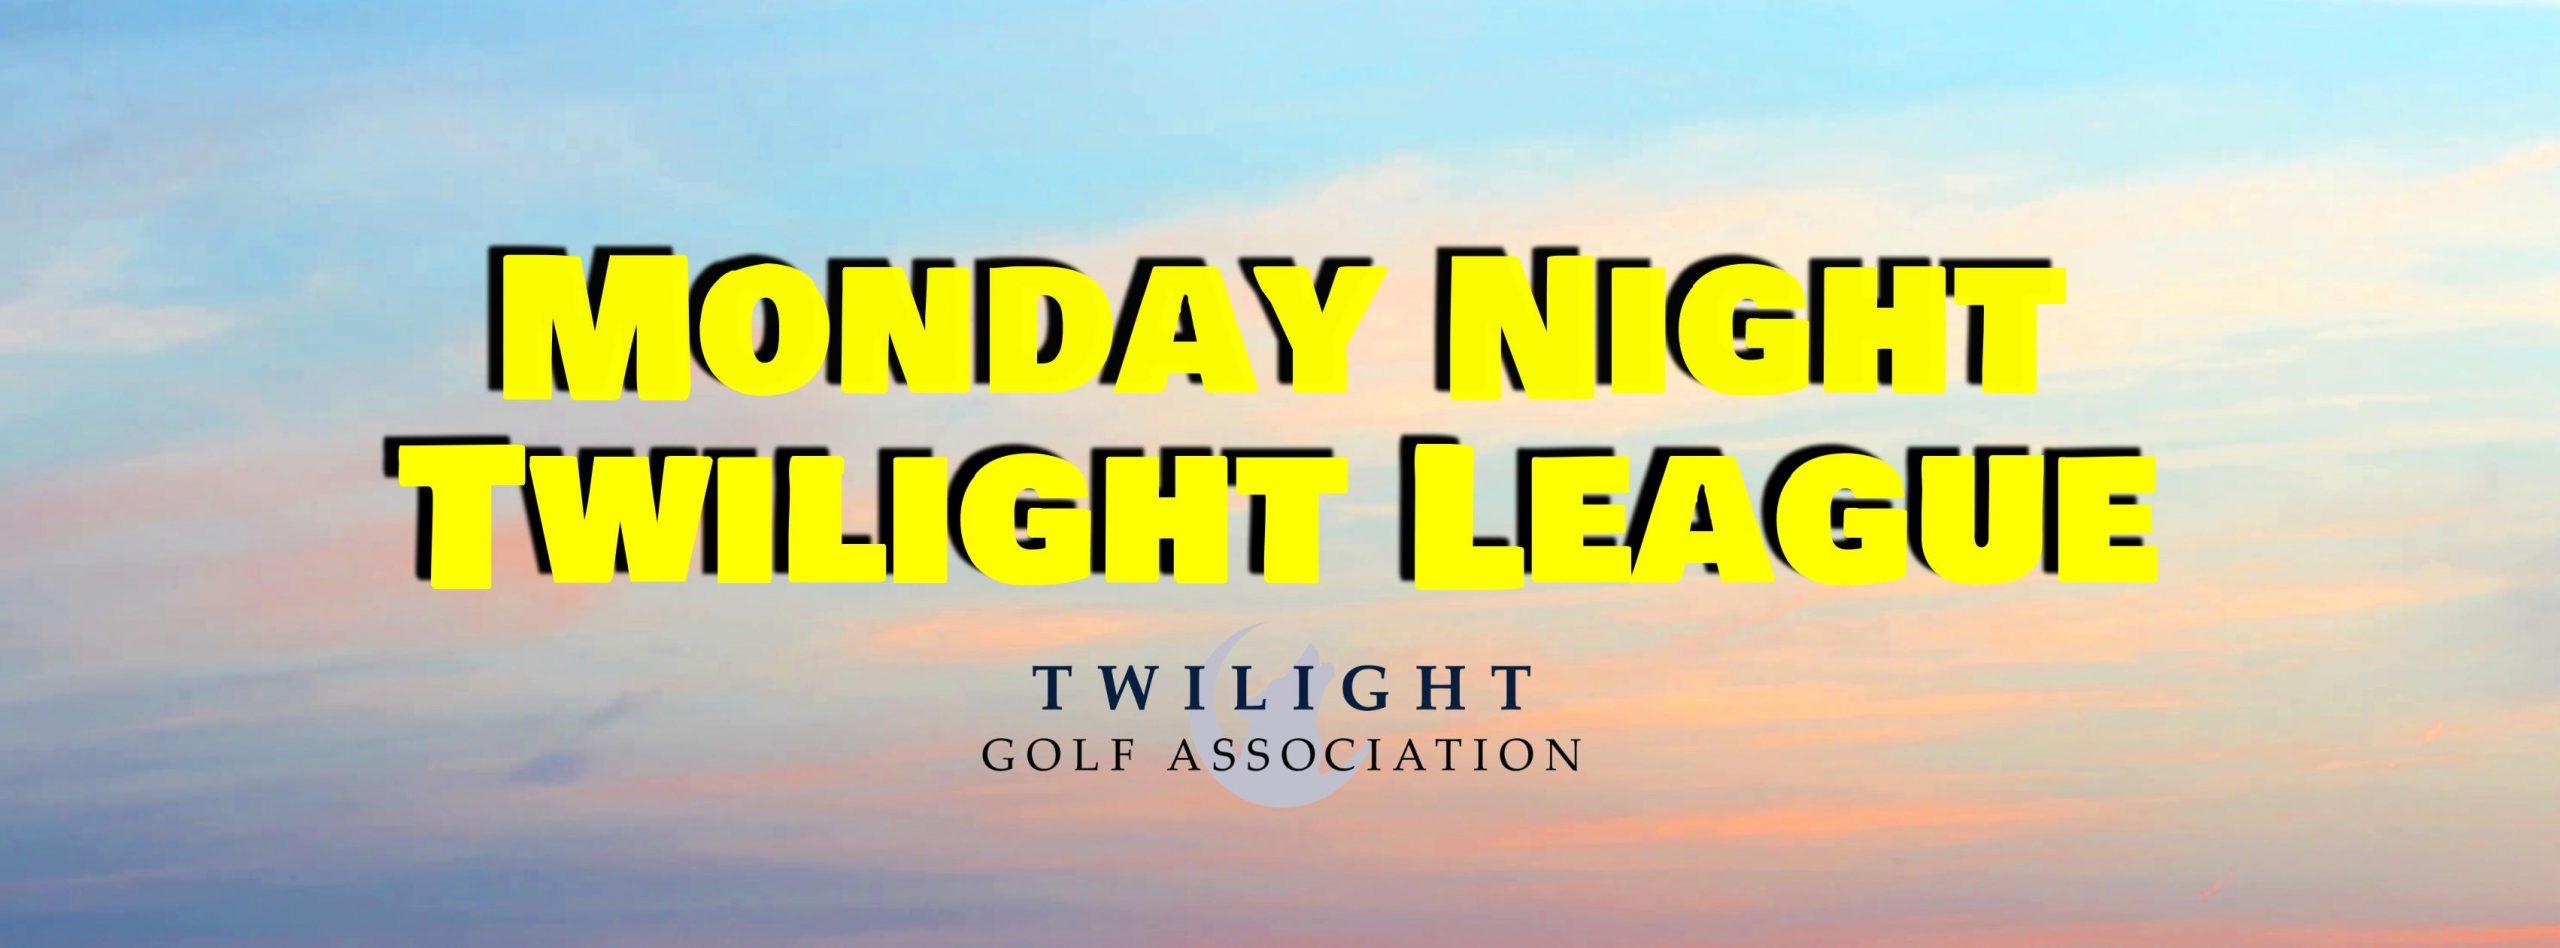 Monday Twilight League at Mount Pleasant Golf Course